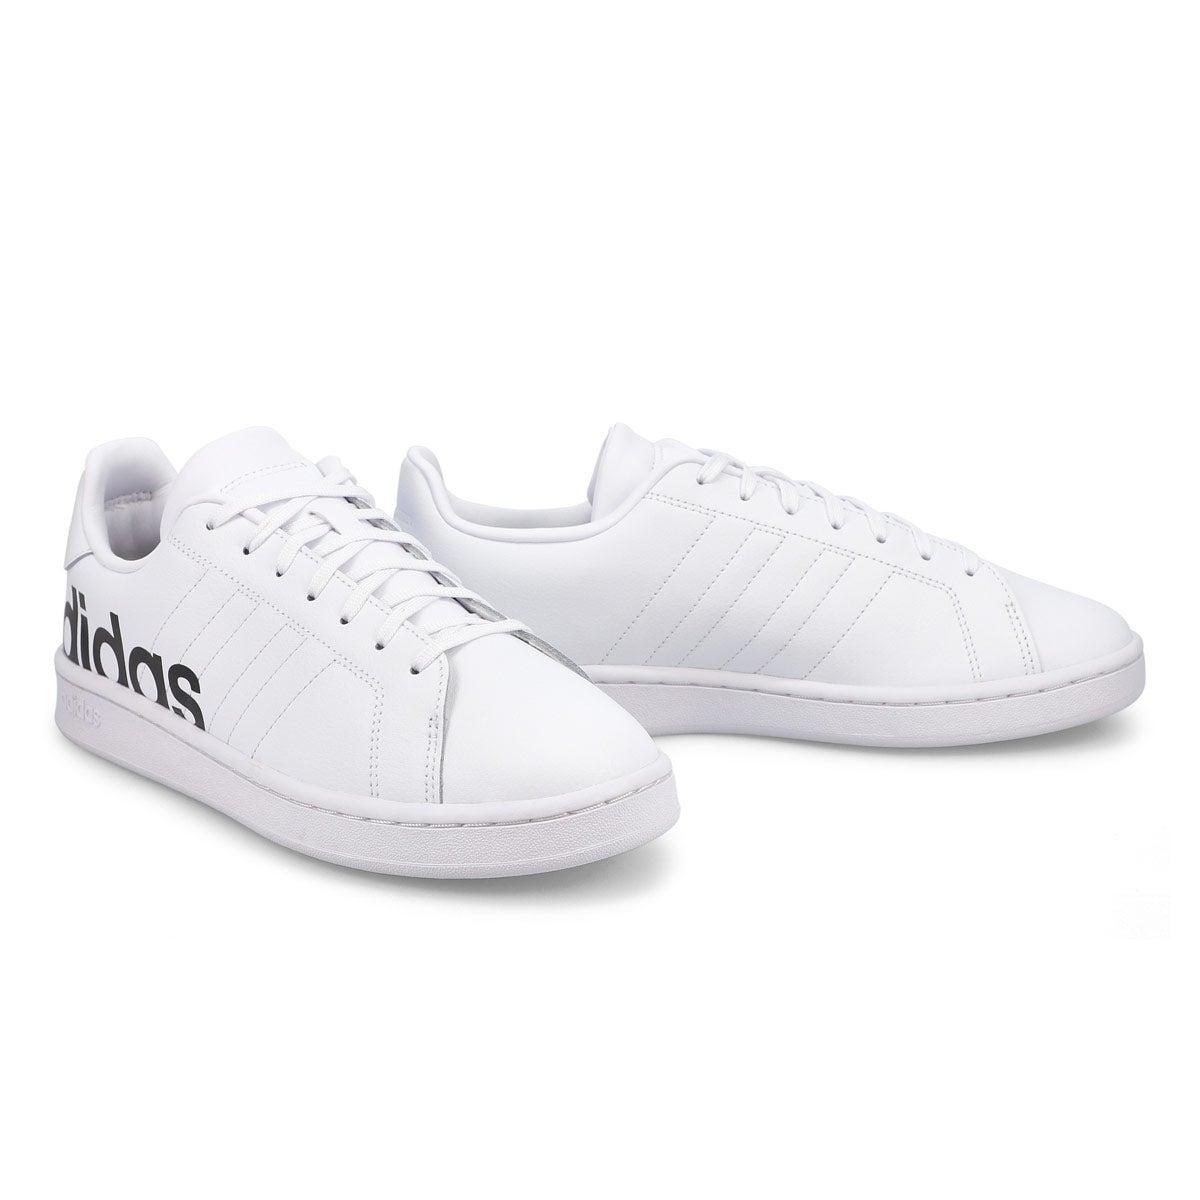 Men's Grand Court Sneakers - White/Black